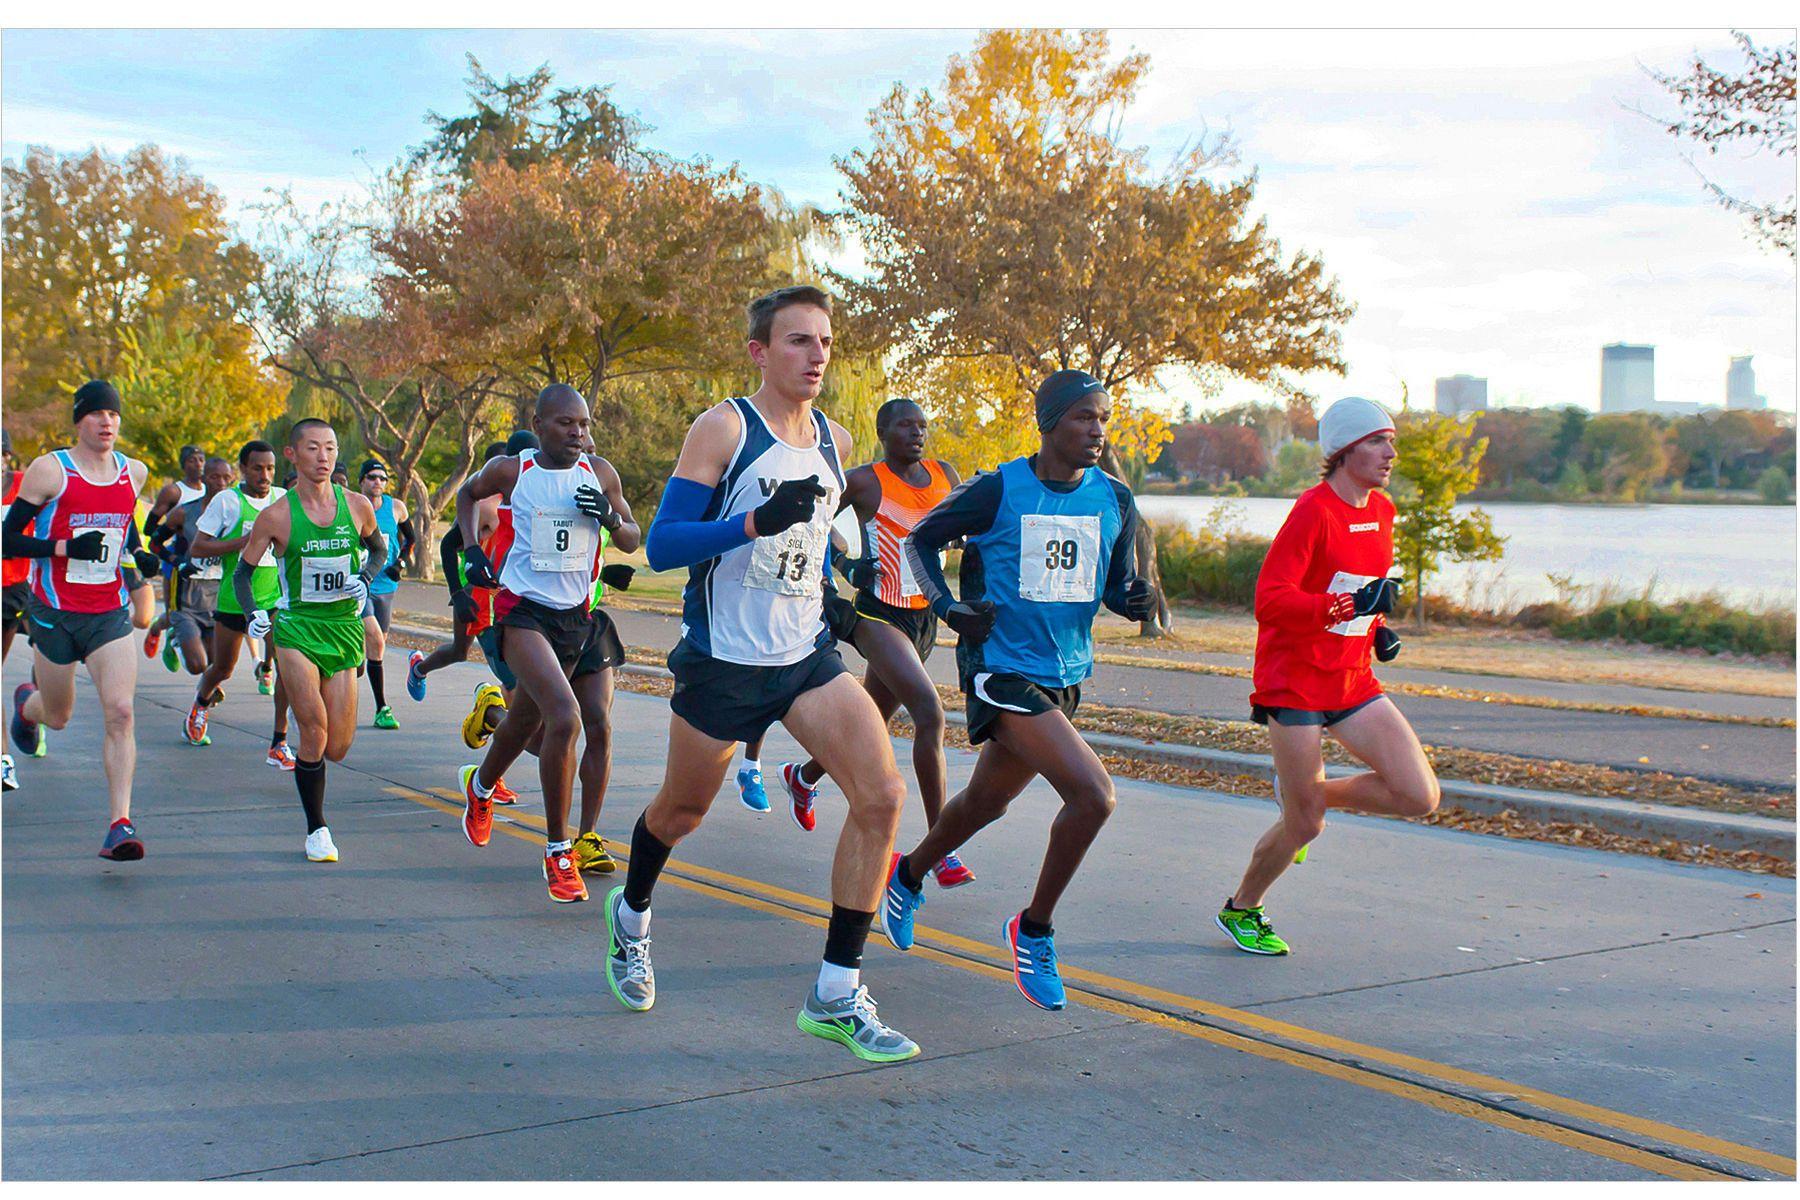 1tc_marathon.jpg